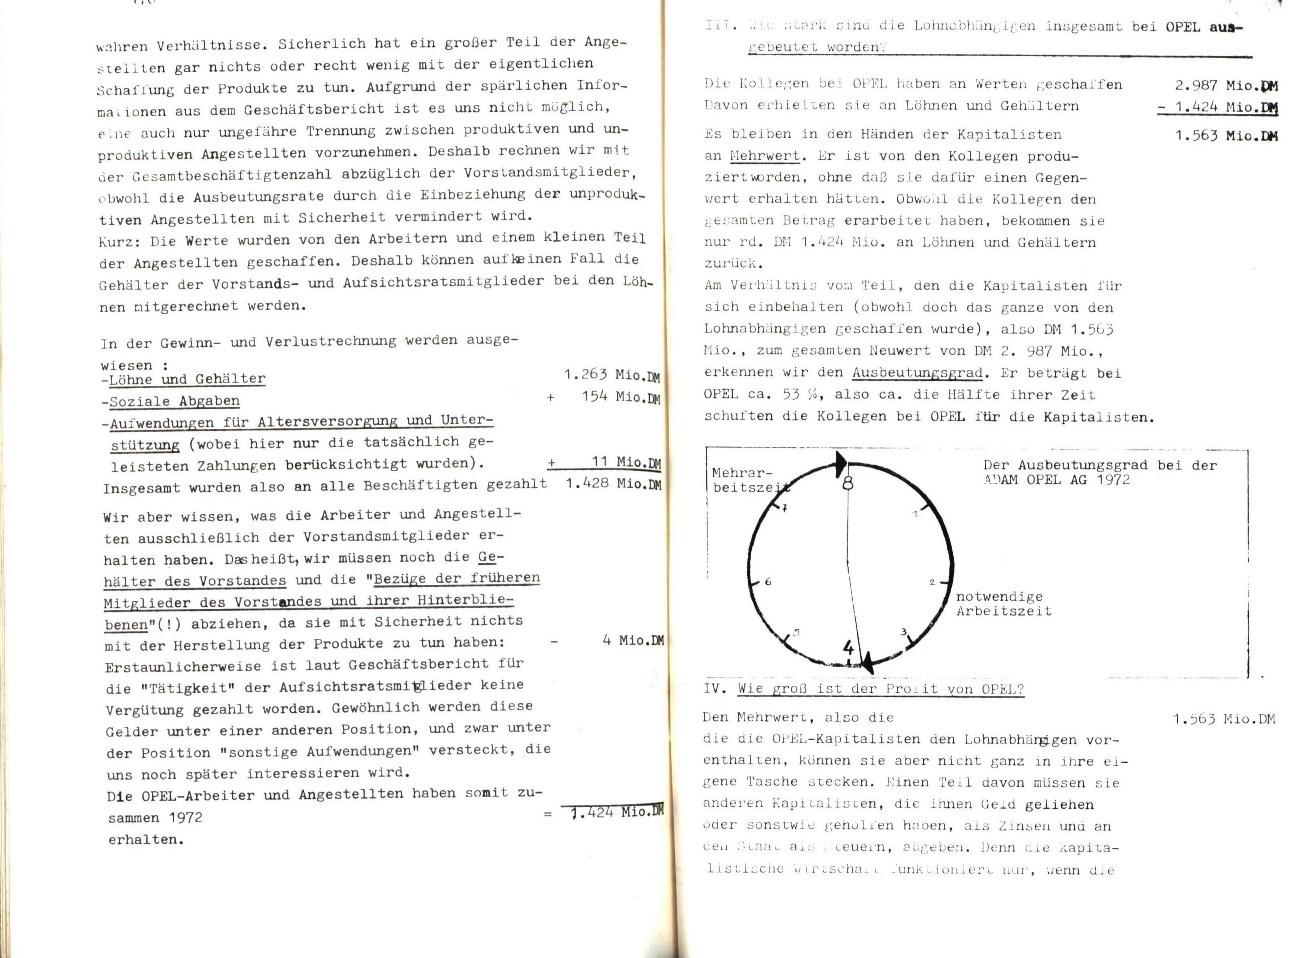 Bochum_IGM_Opel_PG_Opel_streikt_1973_088